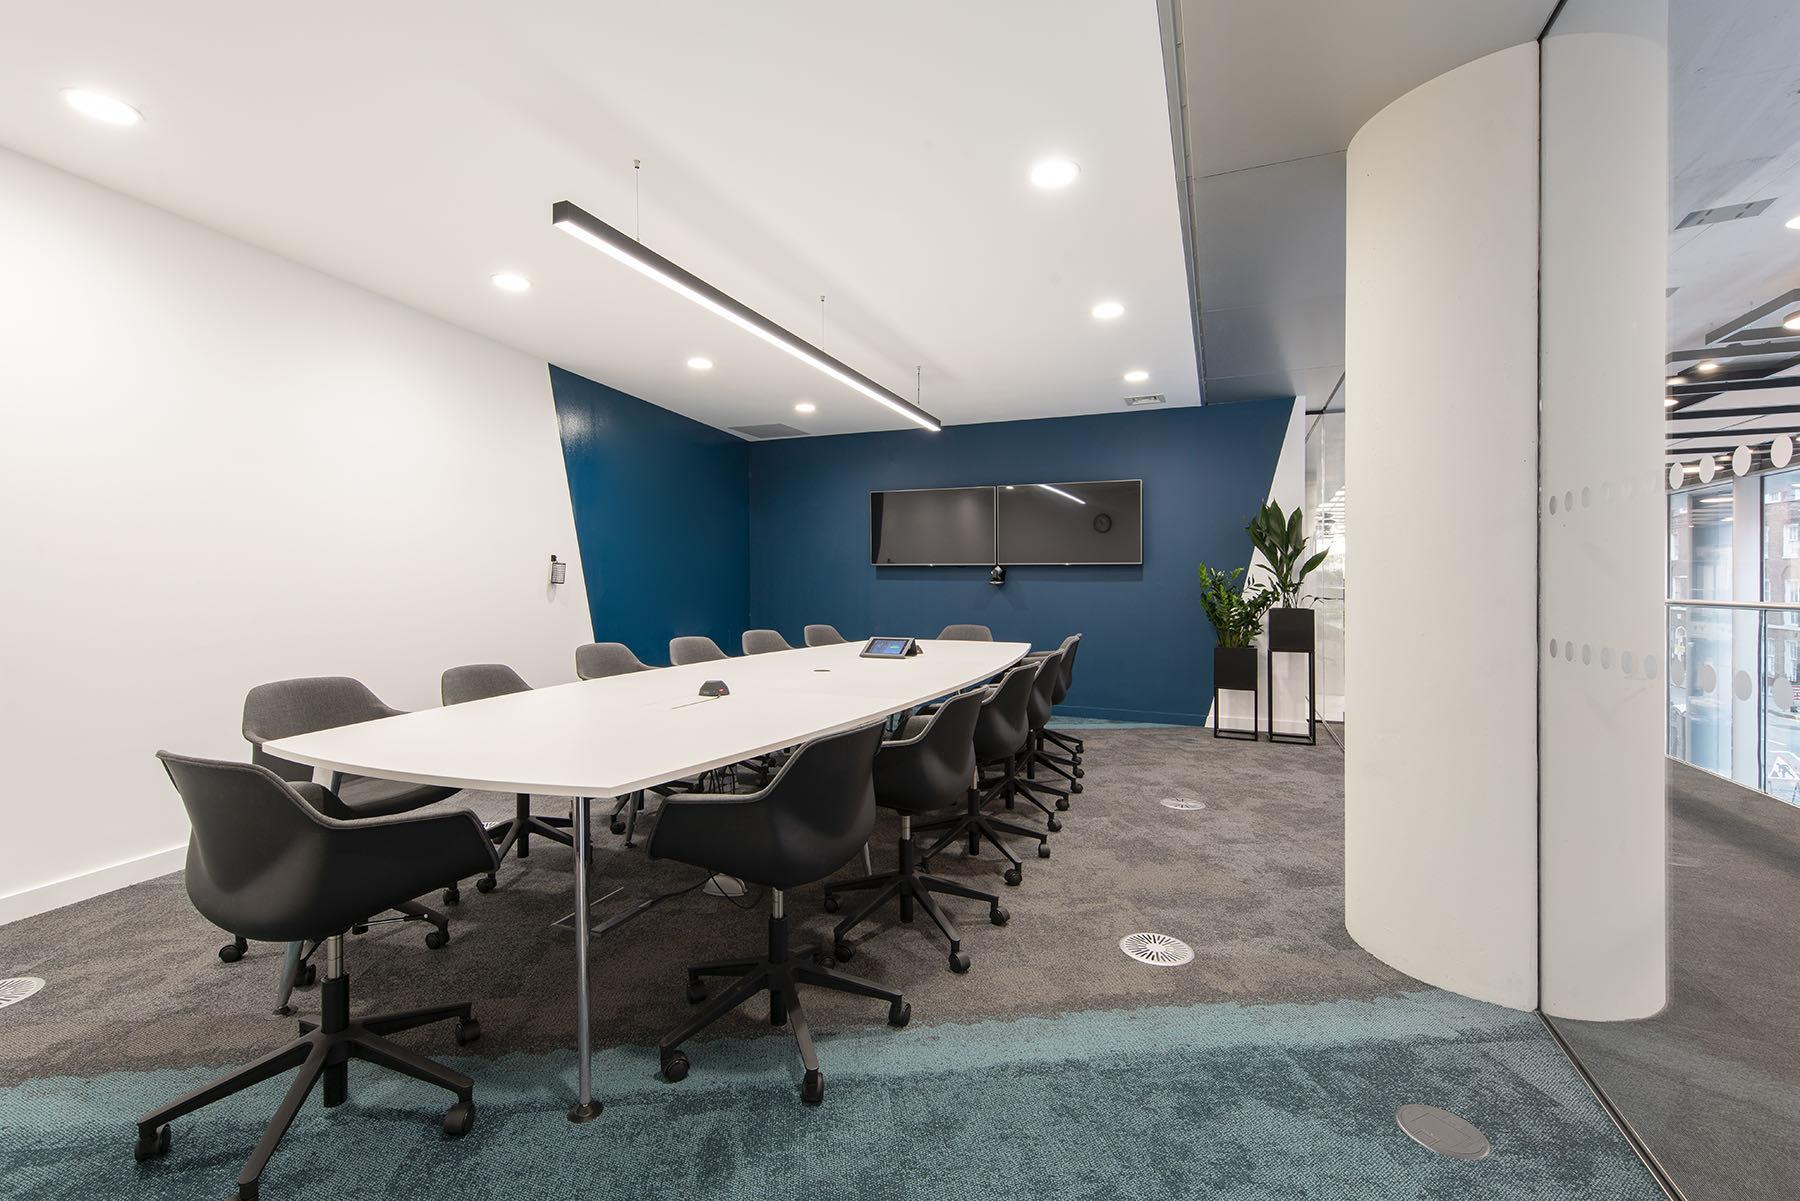 metapack-london-office-5